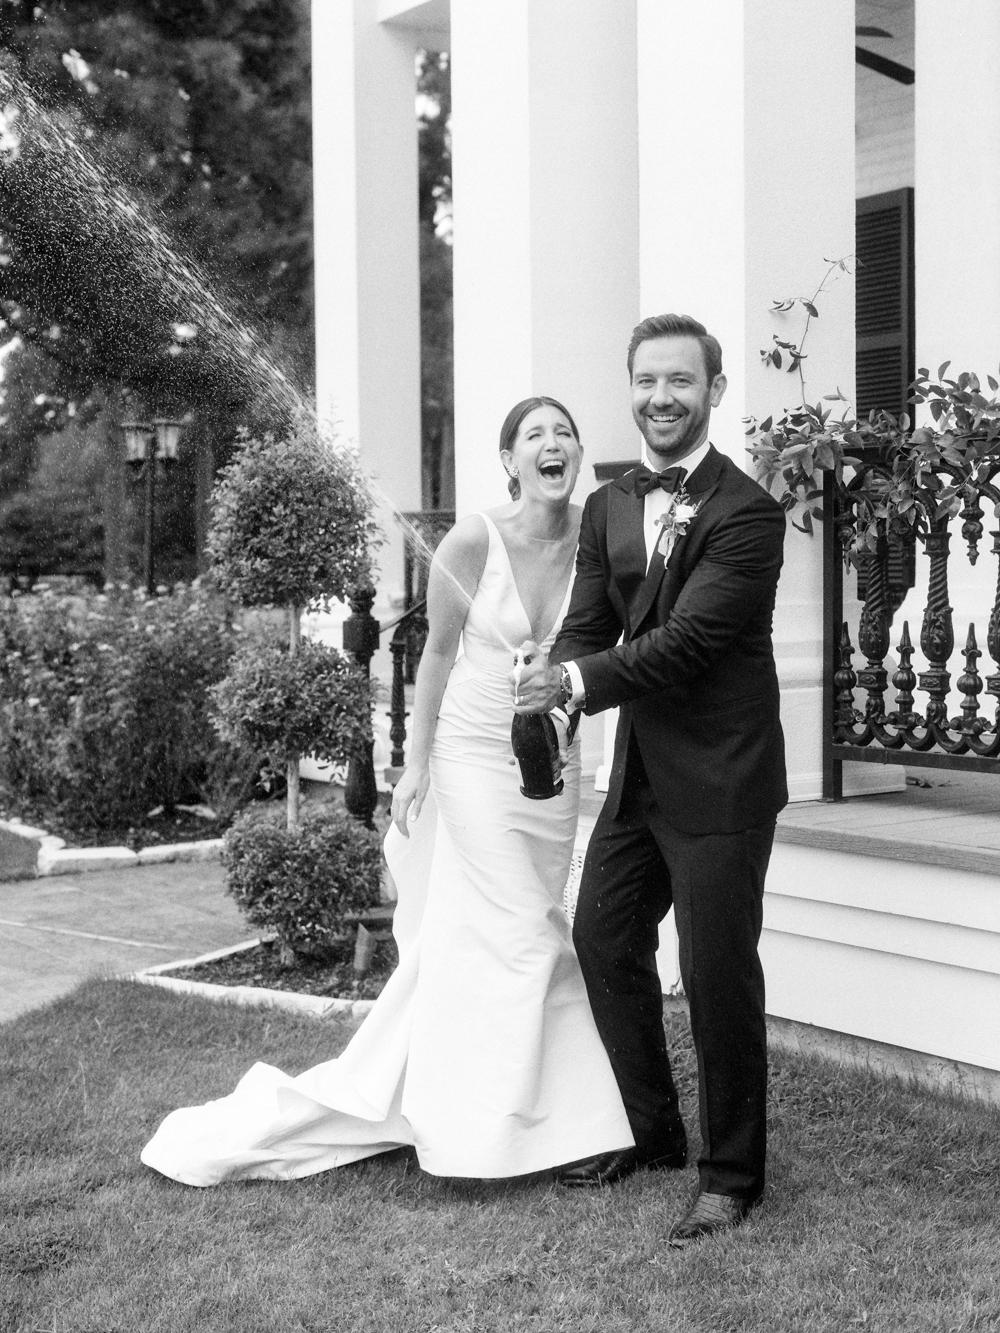 Christine Gosch - destination film photographer - houston wedding photographer - fine art film photographer - elopement photographer - destination wedding - understated wedding - simple beautiful wedding photography-98.jpg